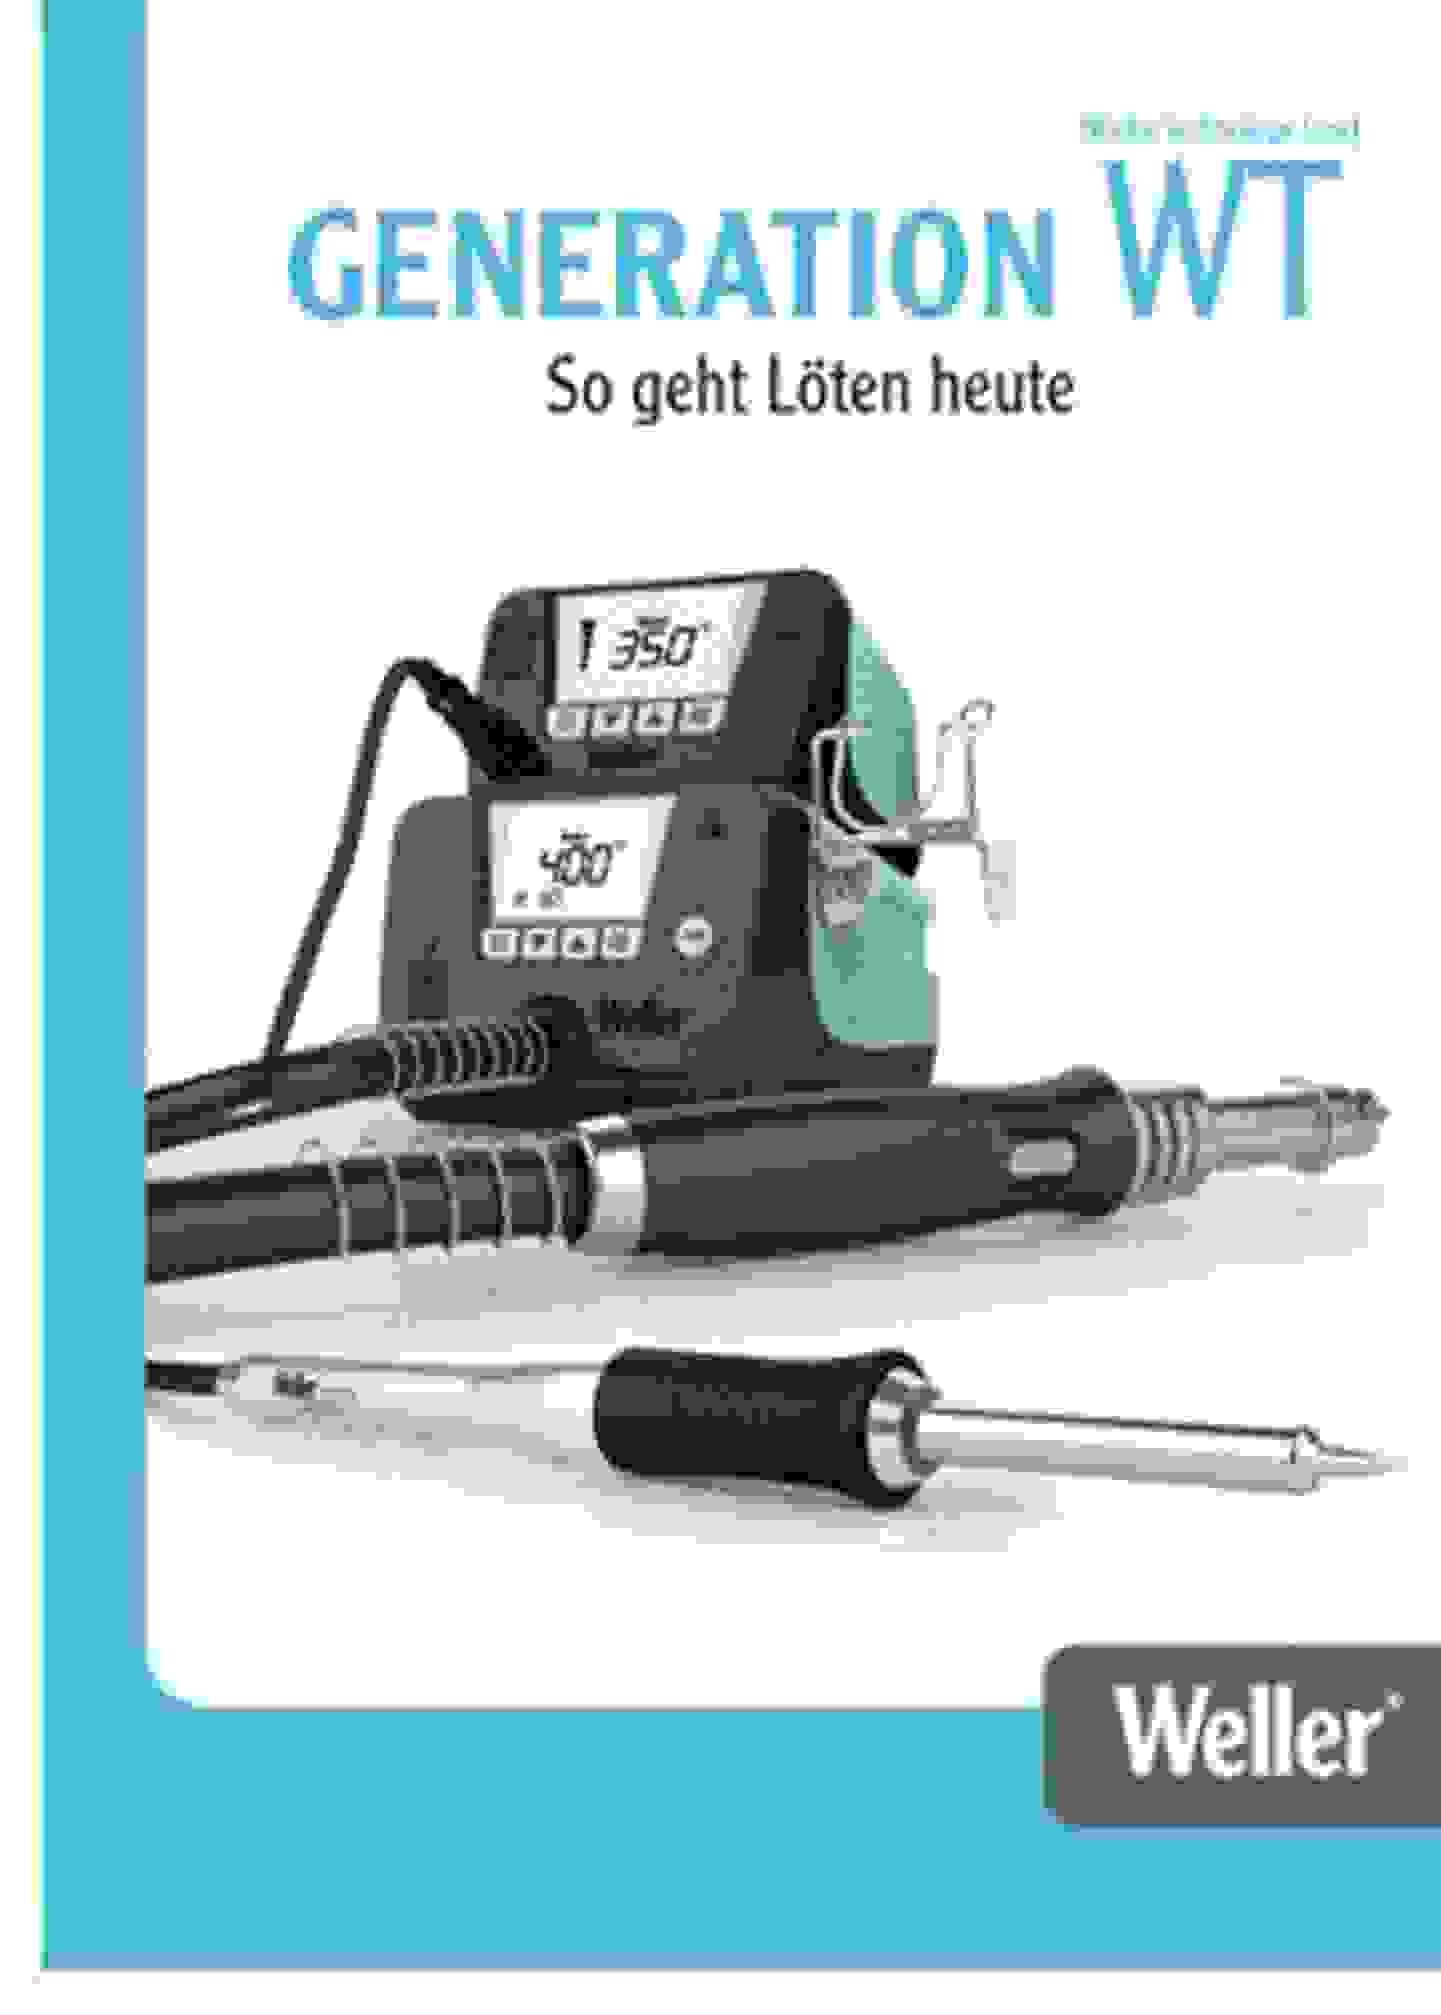 Weller Generation-WT